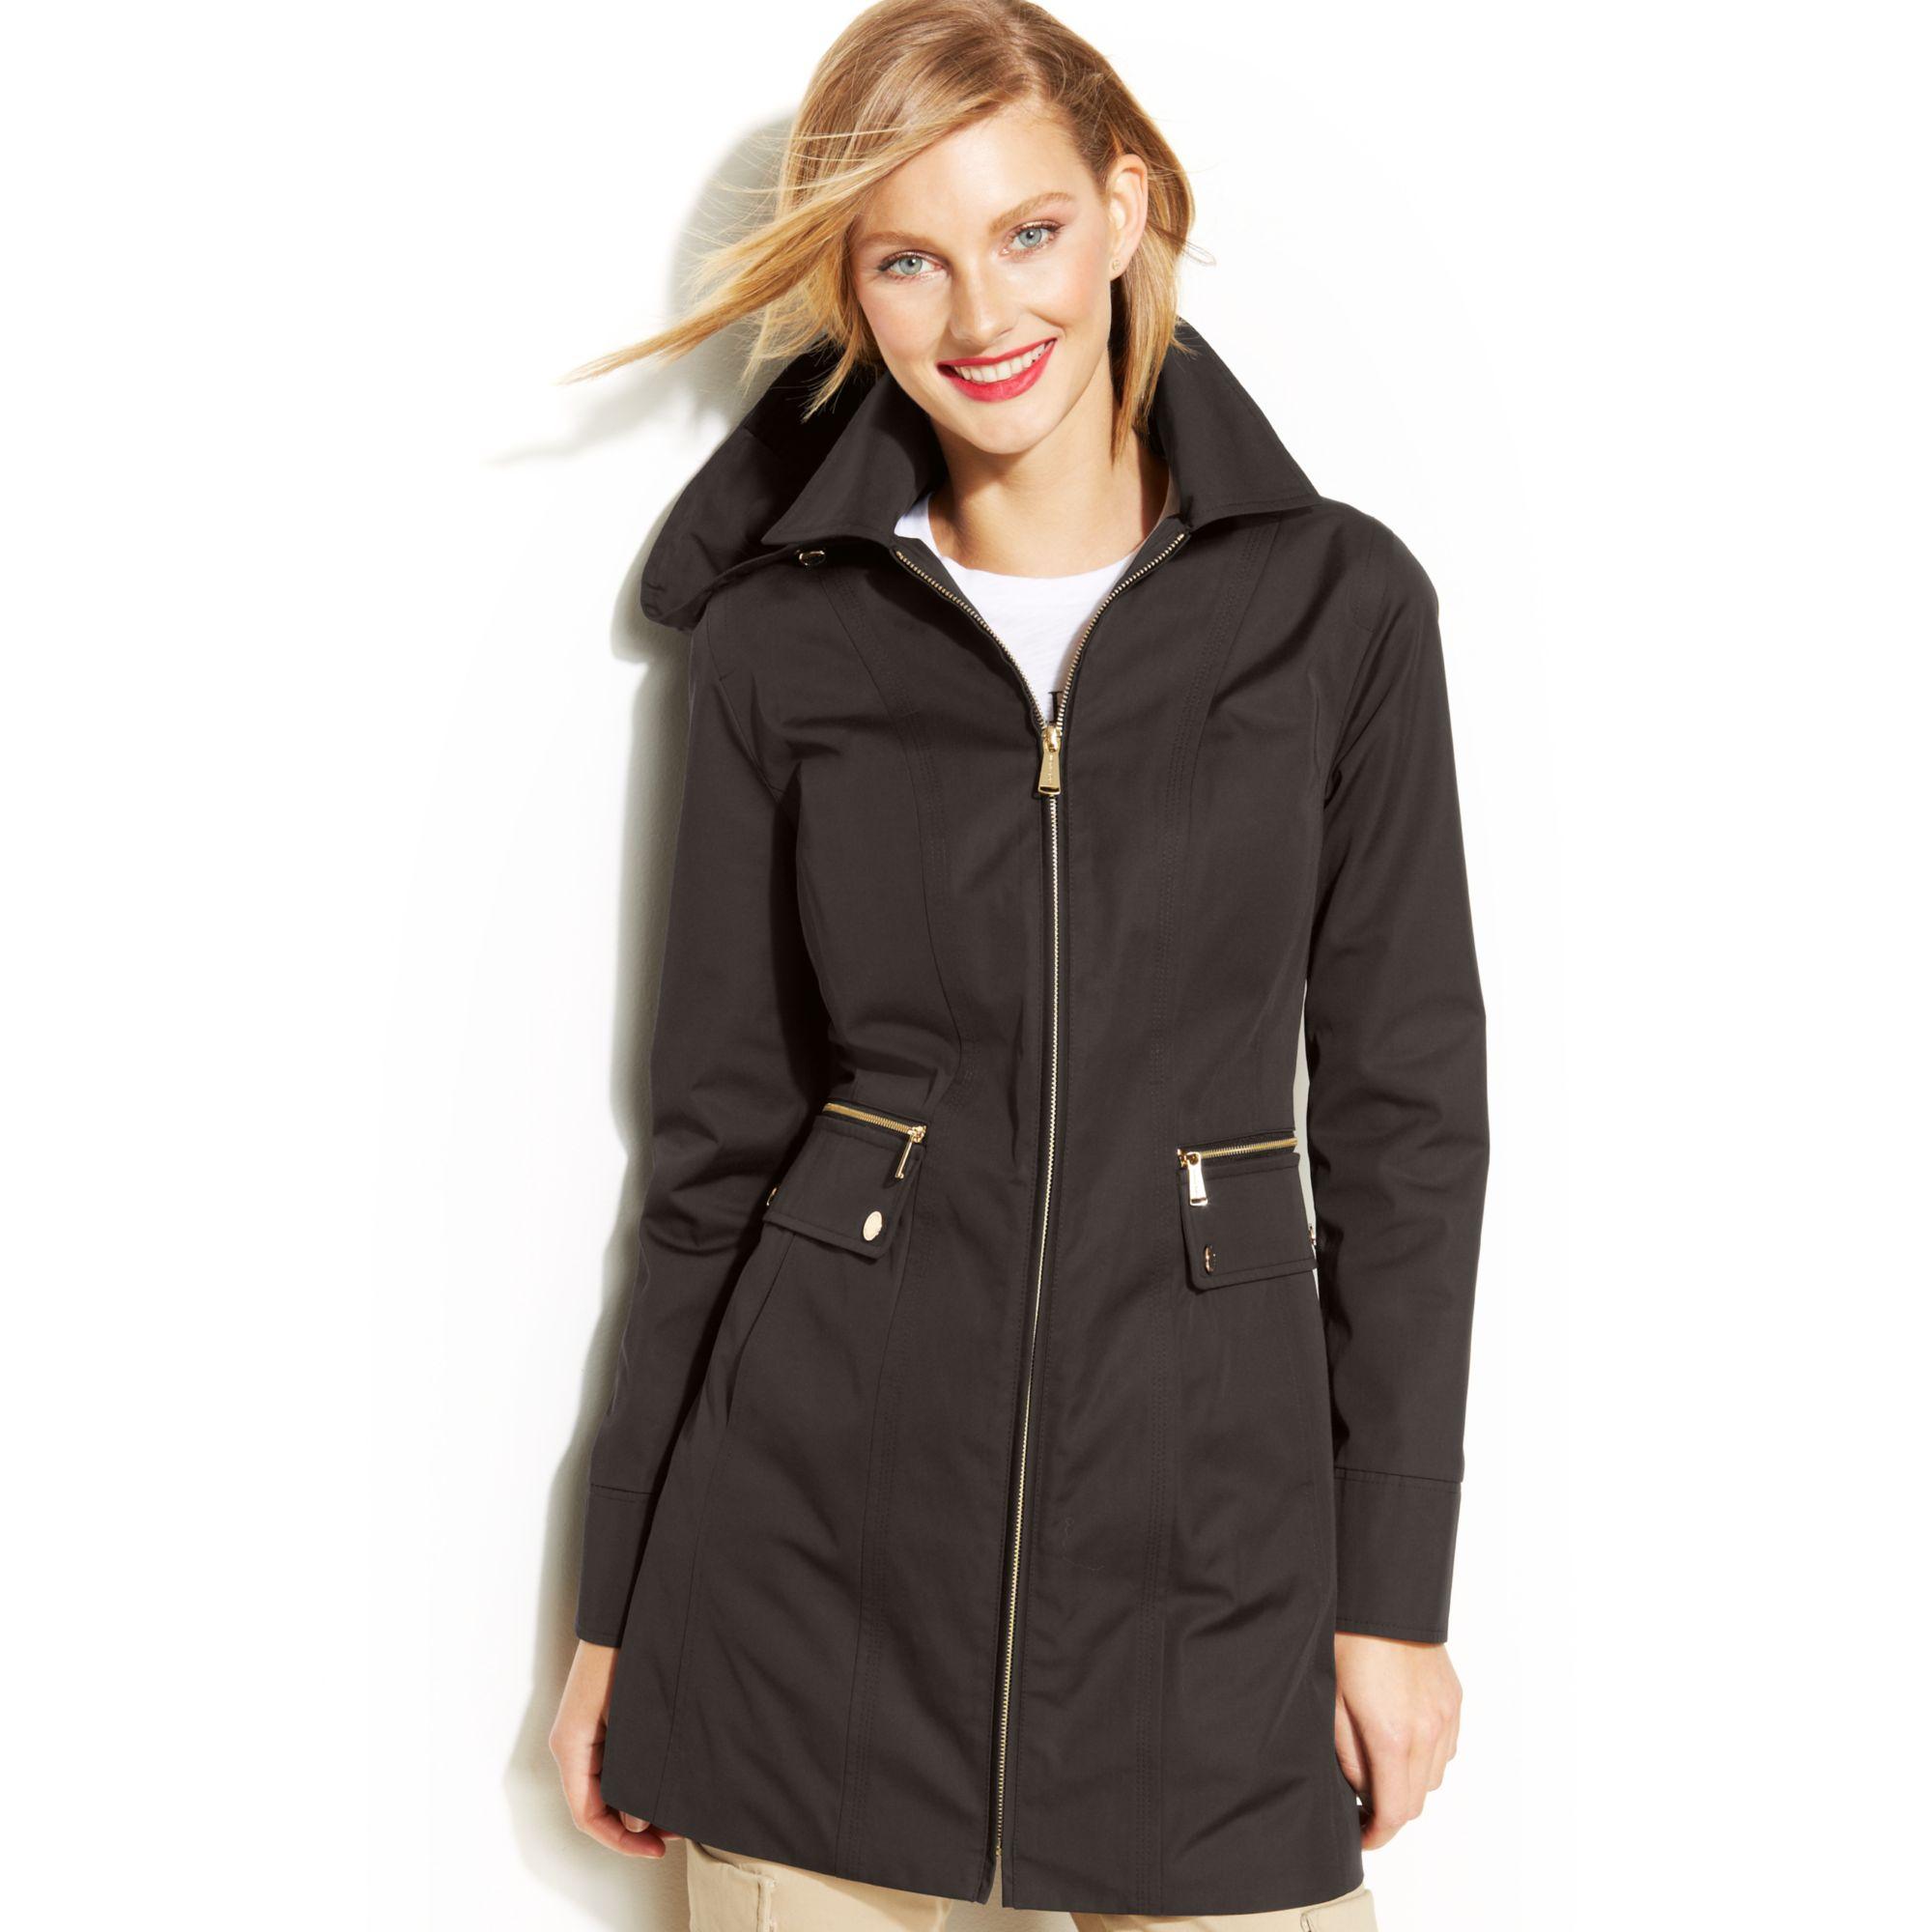 hooded raincoats for women - photo #30